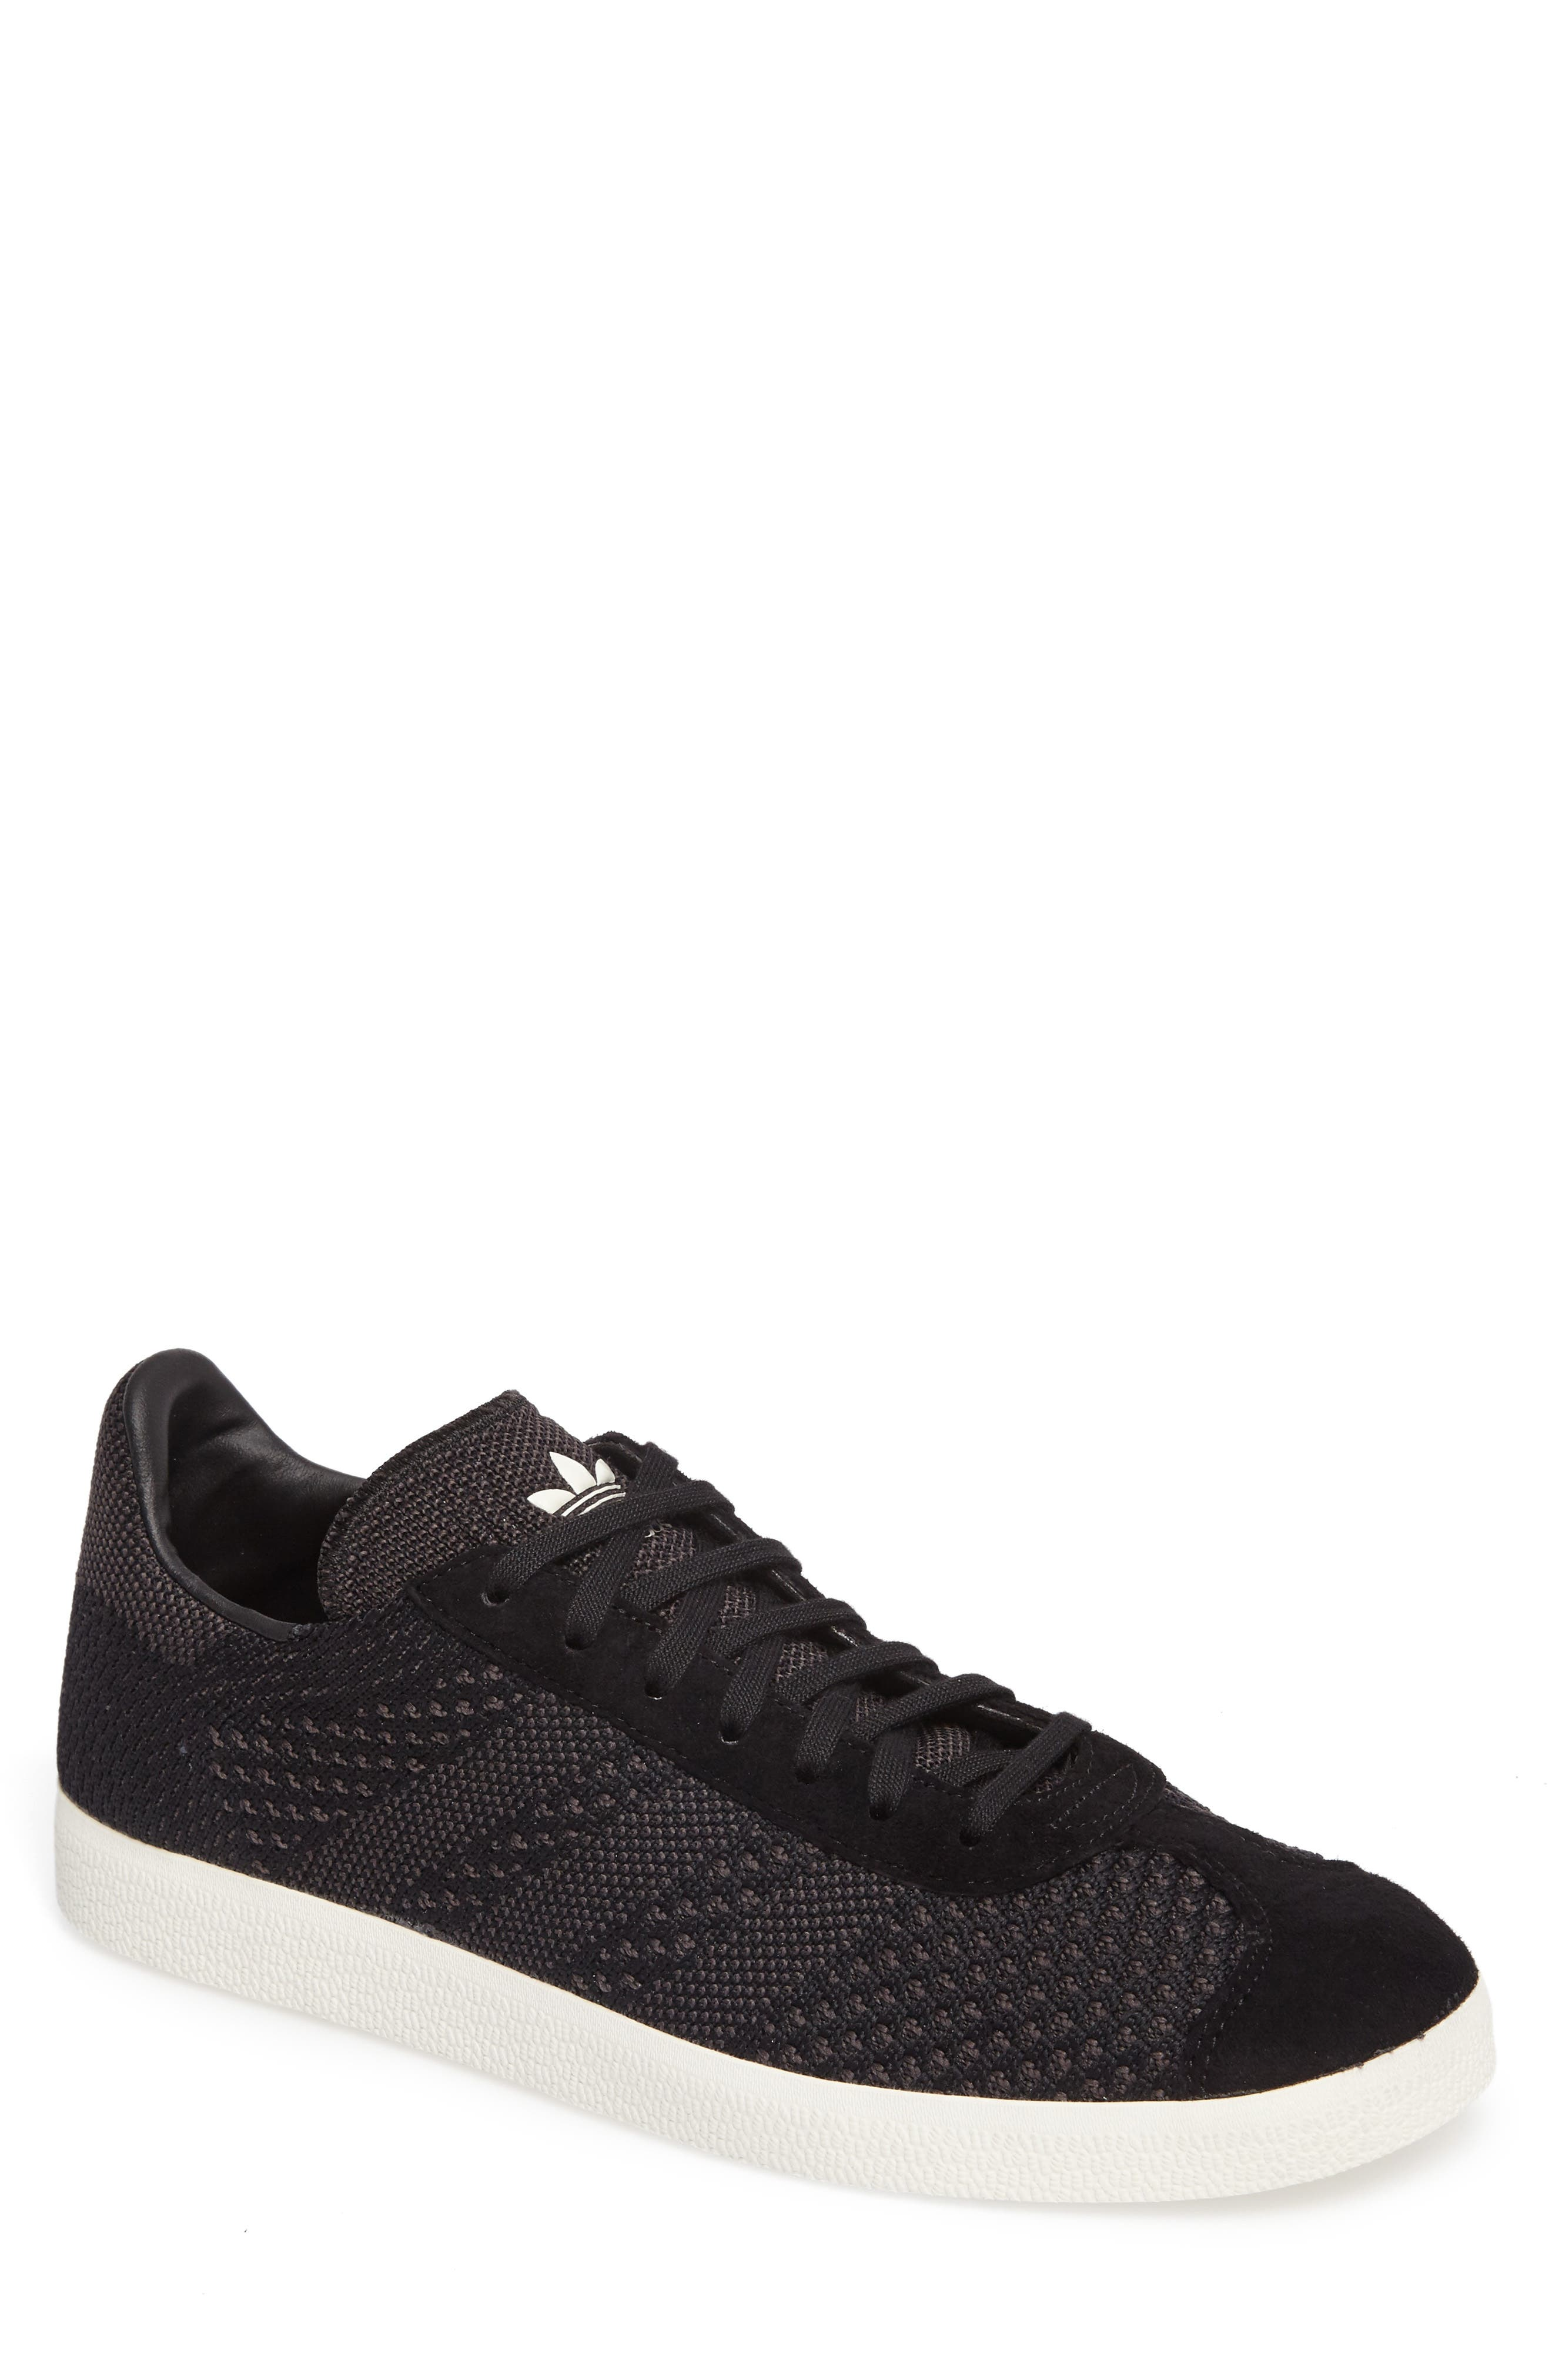 Gazelle Primeknit Sneaker,                             Main thumbnail 1, color,                             001